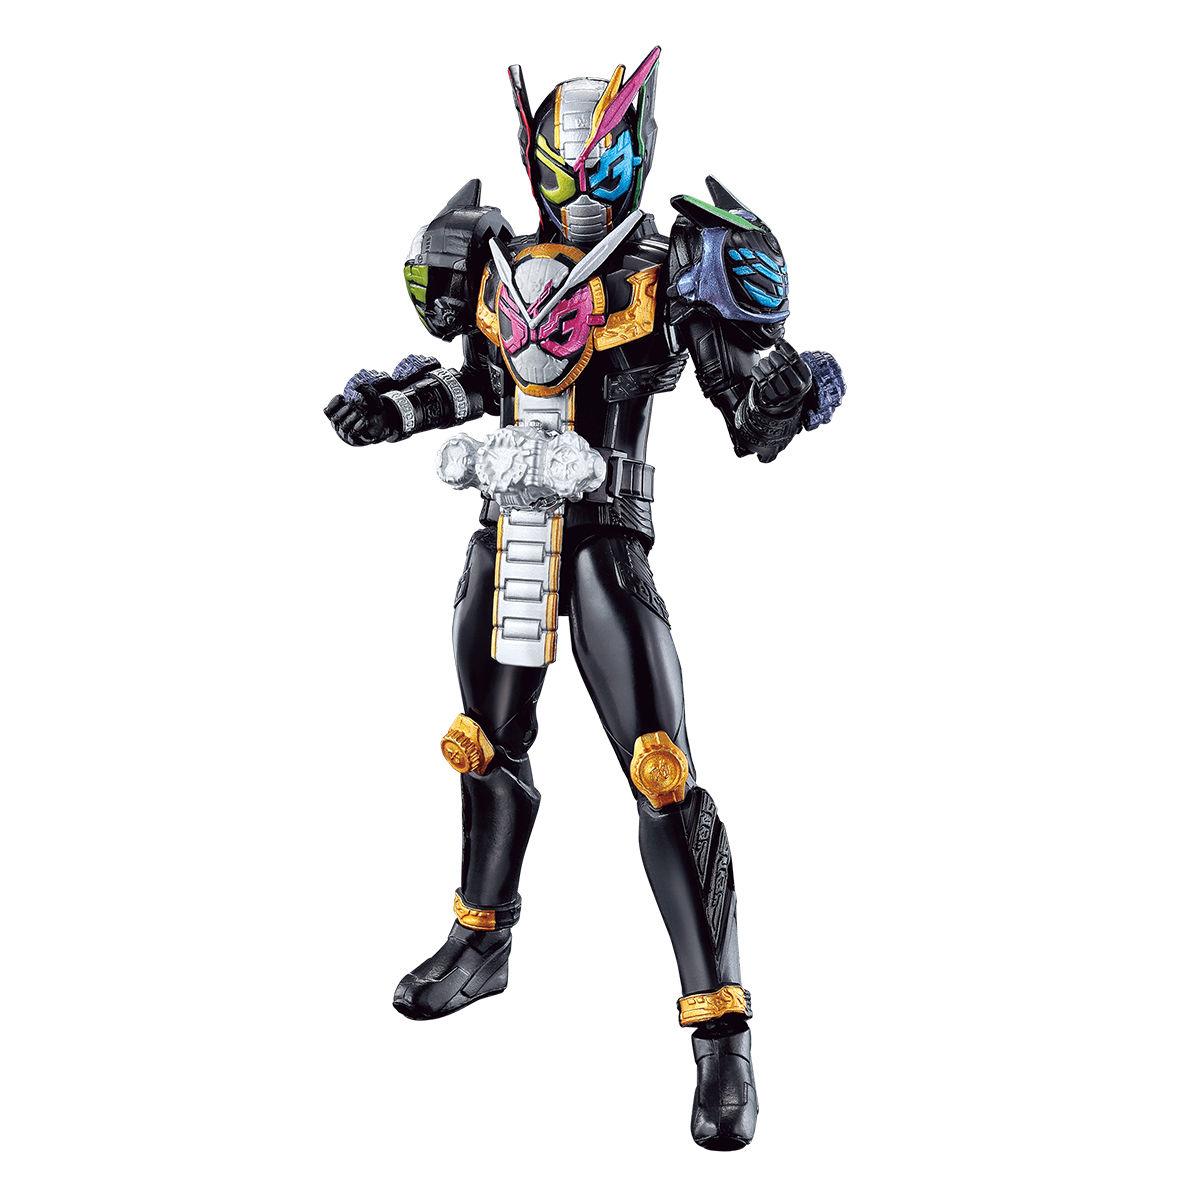 RKFライダーアーマーシリーズ『仮面ライダージオウトリニティ』可動フィギュア-001